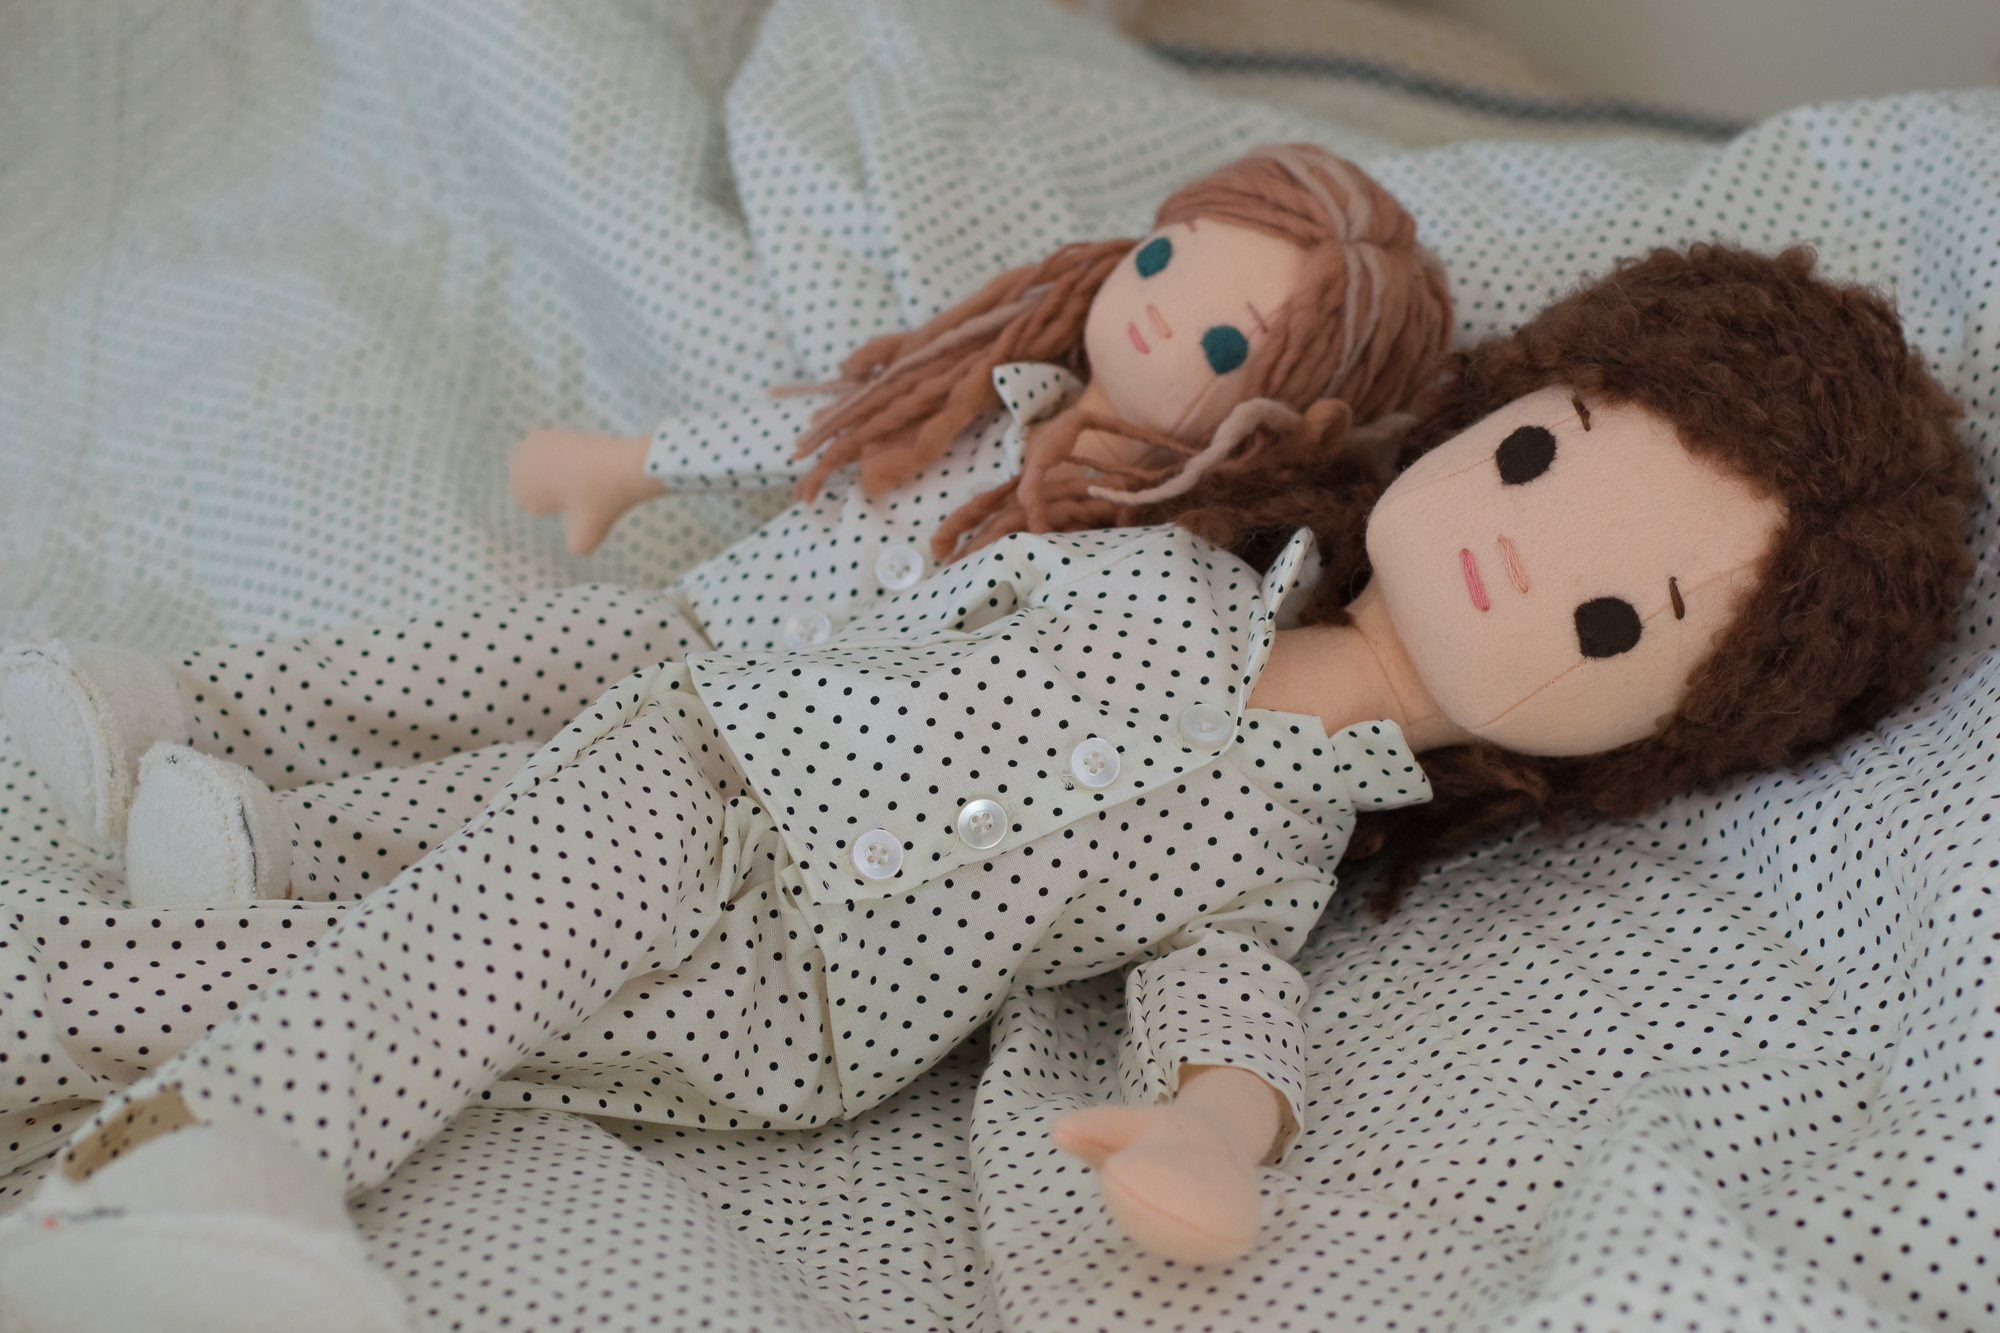 Gallery of Dolls-23.jpg